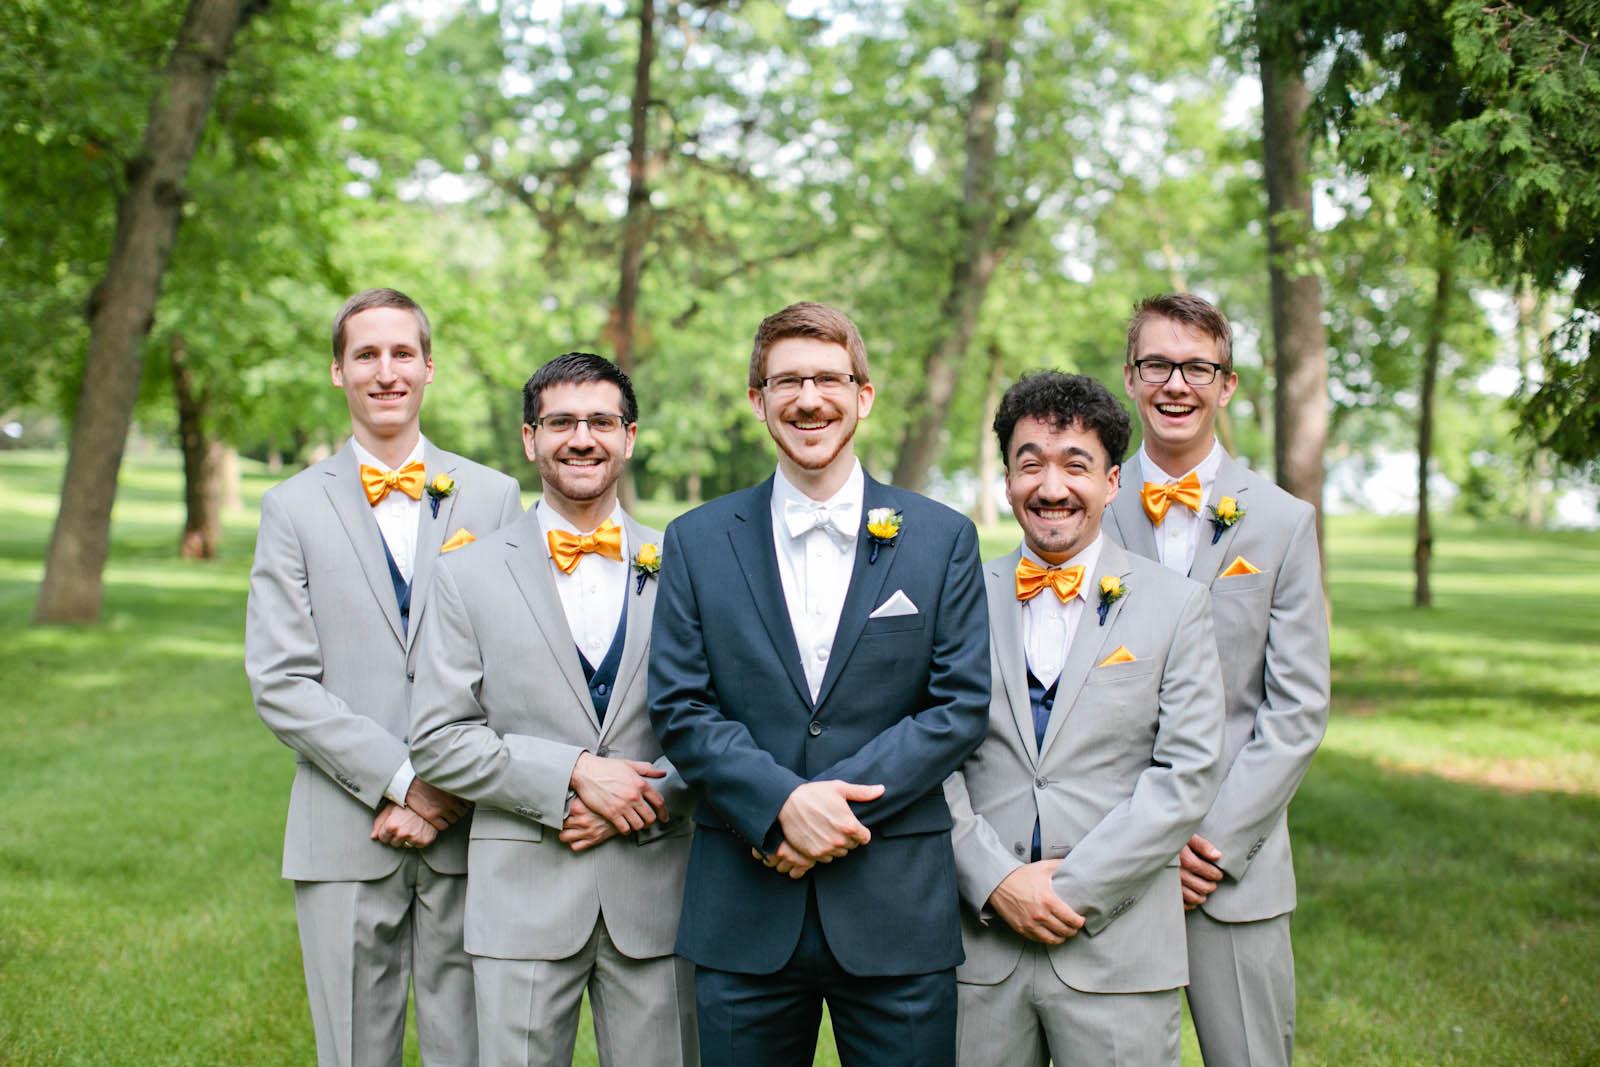 fun groomsmen wedding photo minnesota photographer